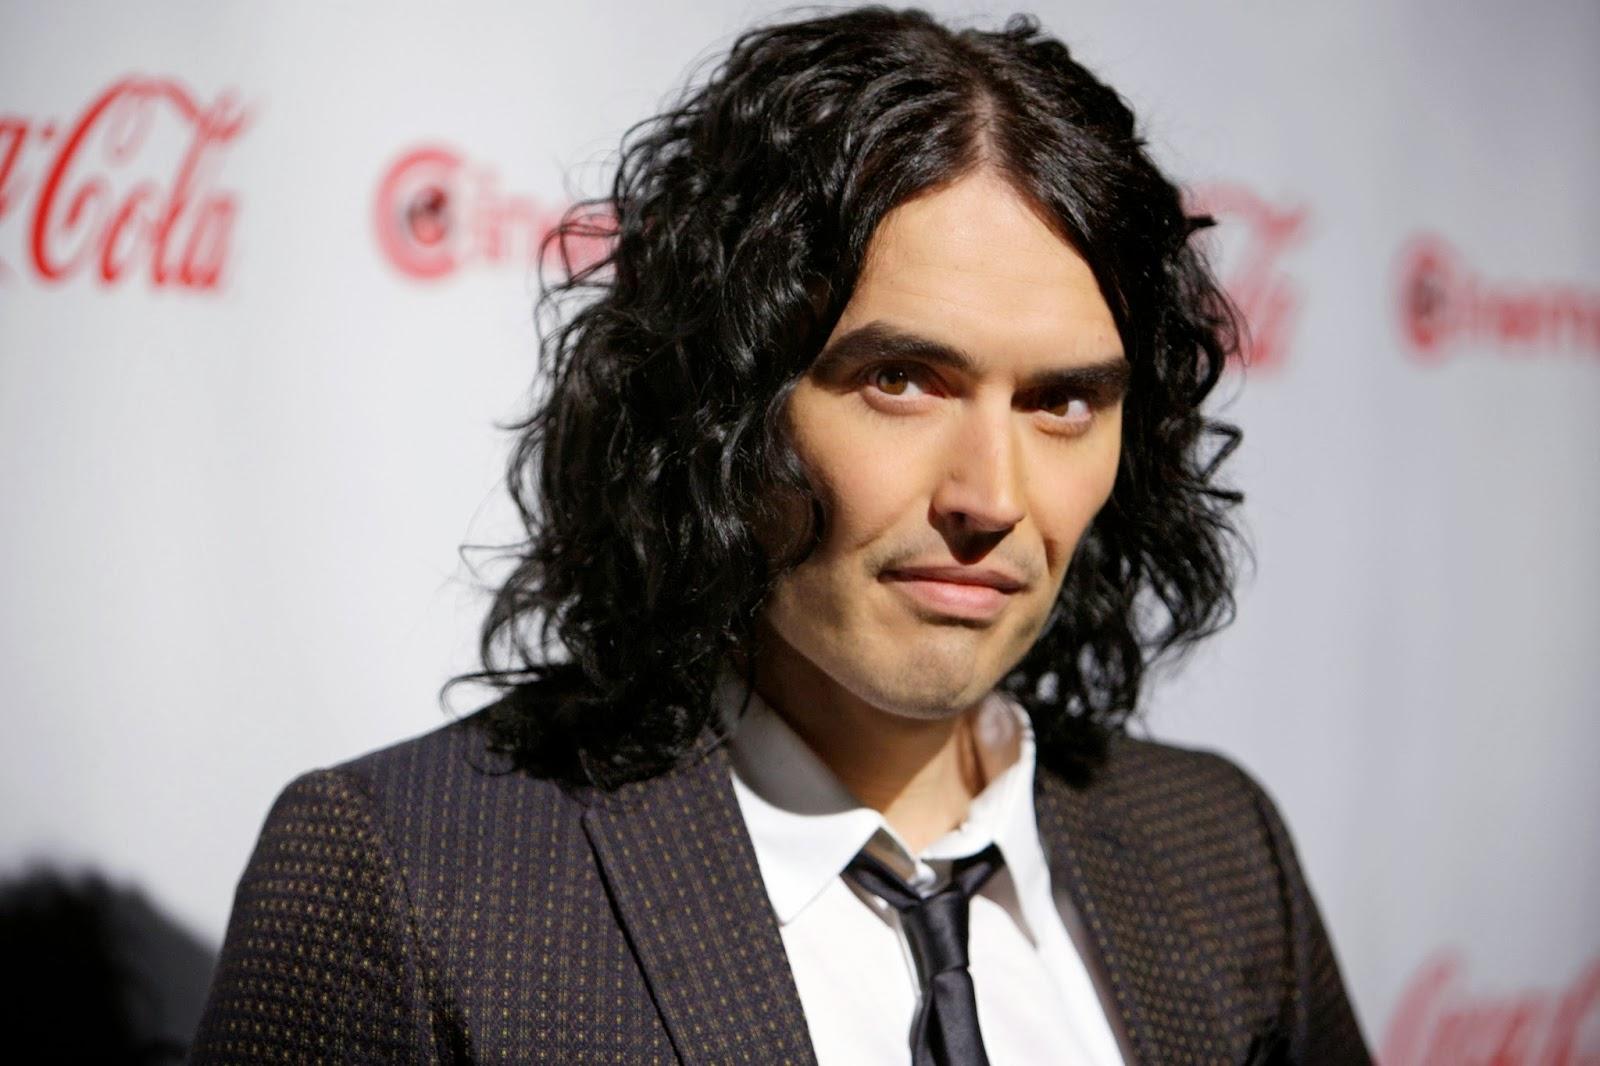 russell brand british comedian actor gossip styles